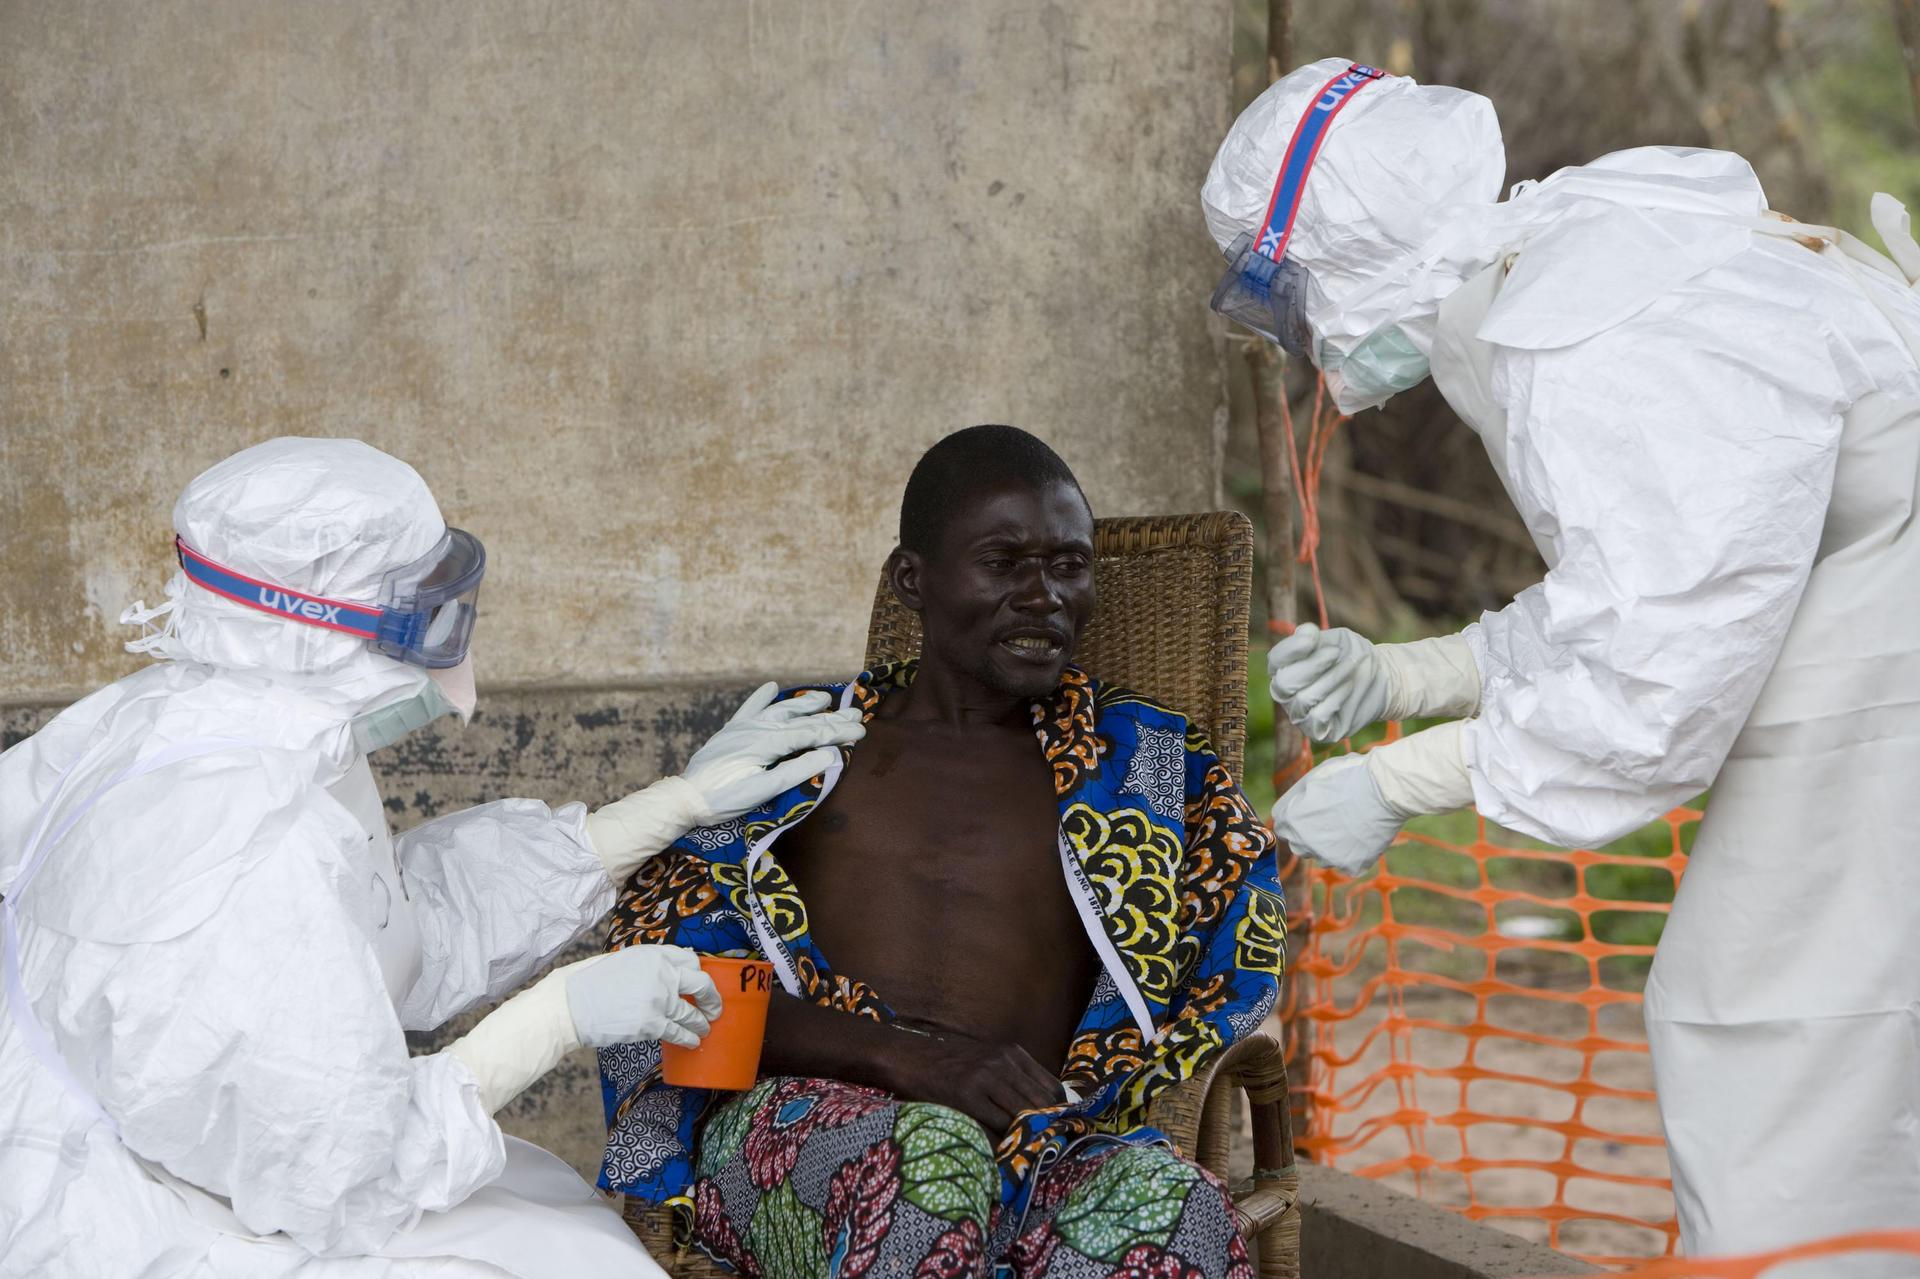 Vírus do ebola ainda continua se disseminando